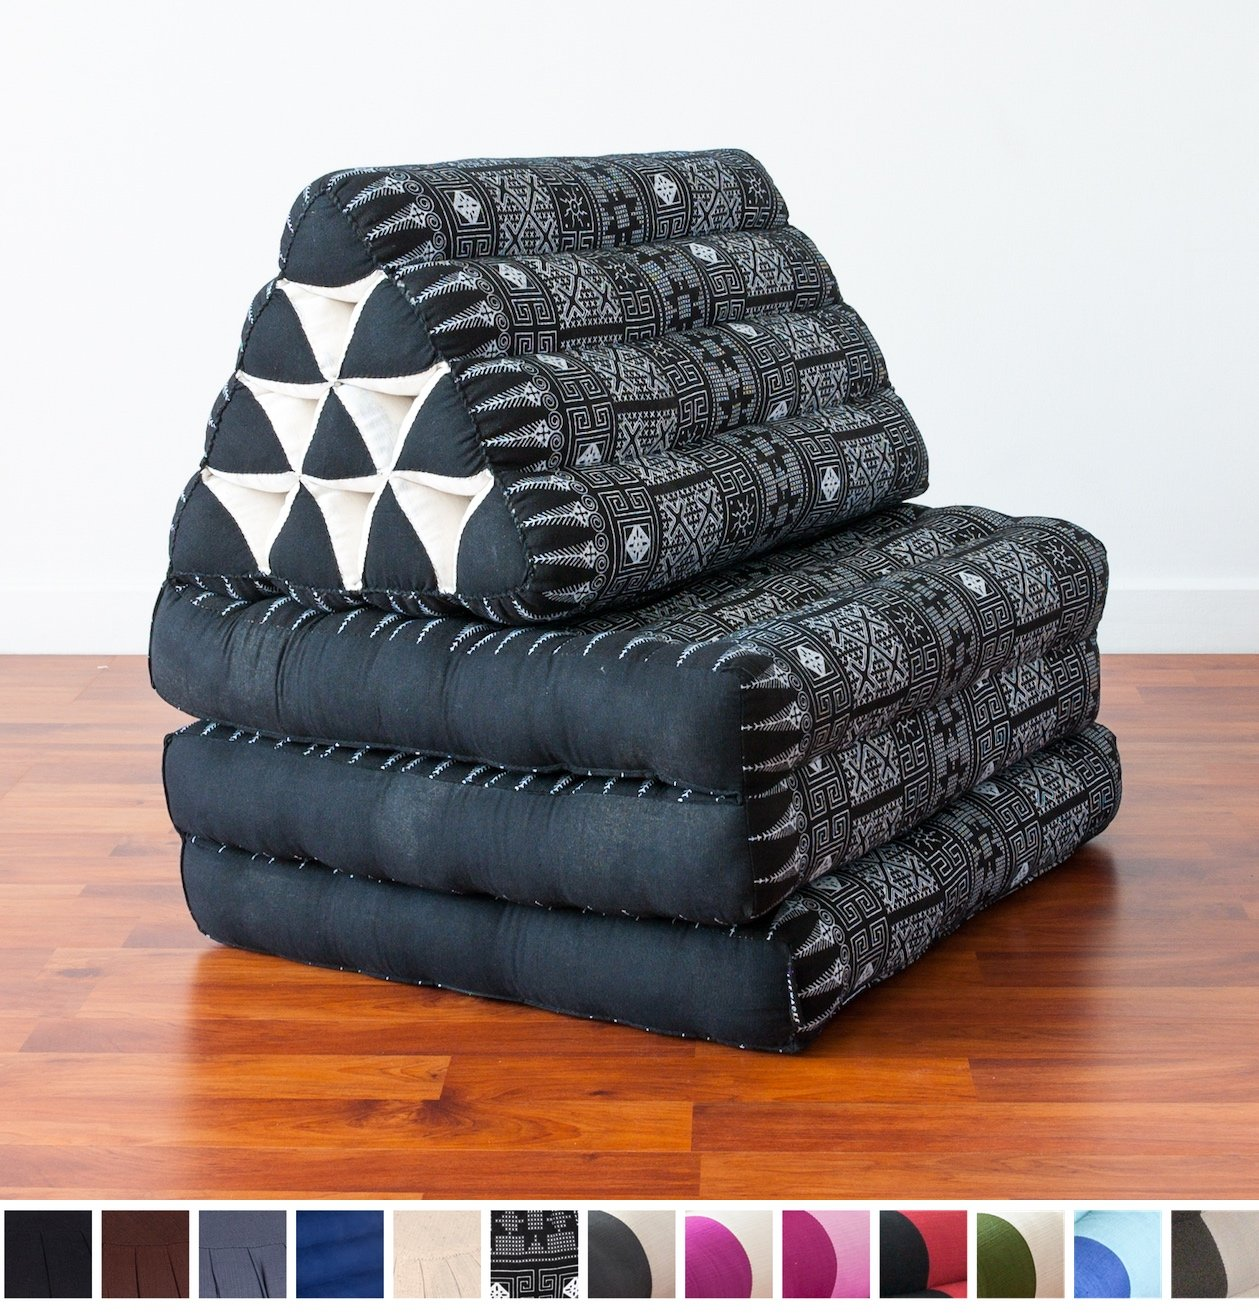 Leewadee Foldout Triangle Thai Cushion, 67x21x3 inches, Kapok Fabric, Black, Premium Double Stitched by Leewadee